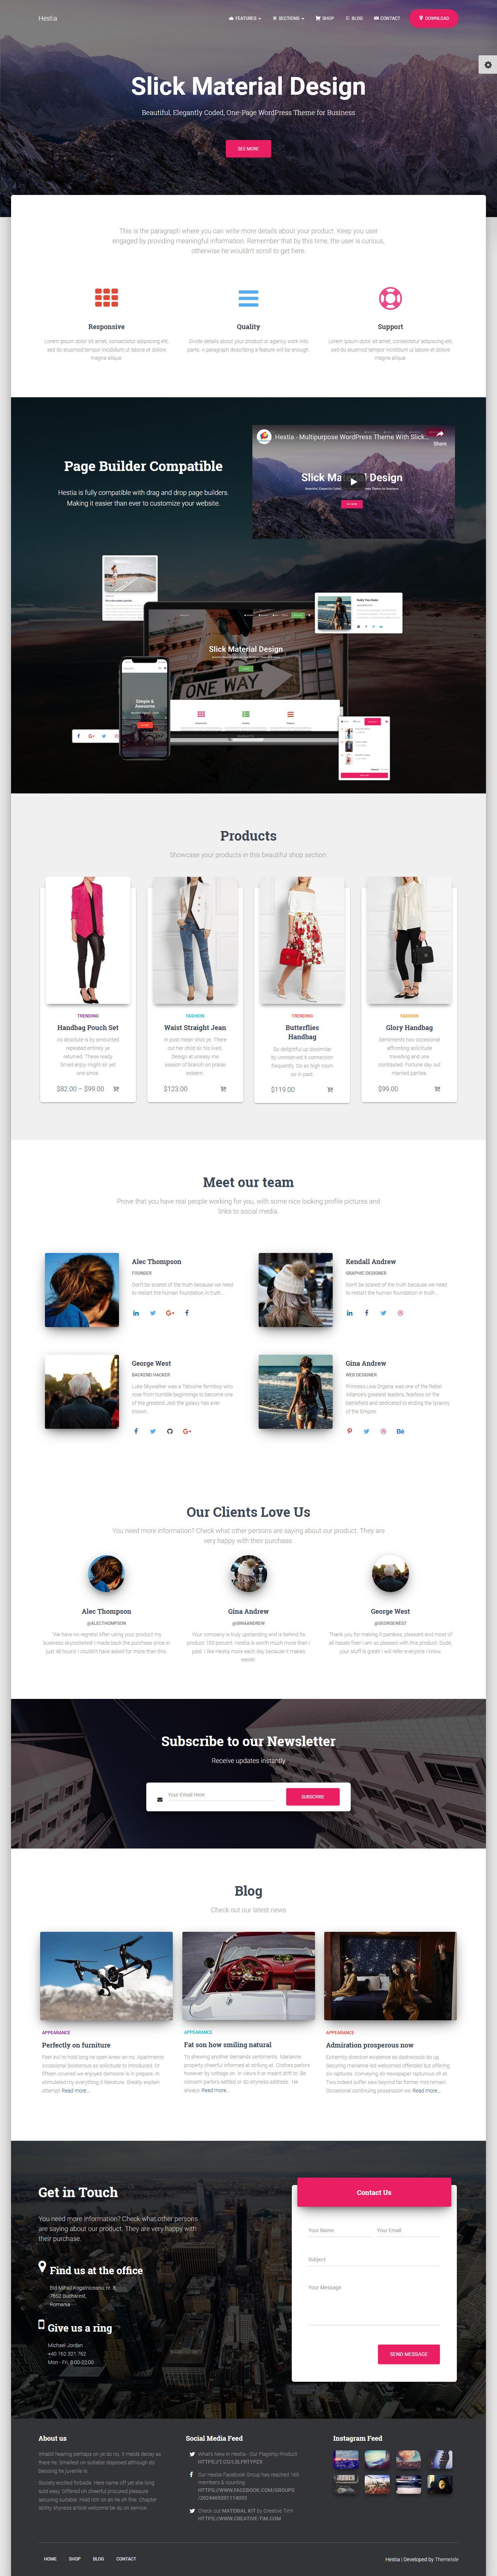 Hestia - Best Free Material Design WordPress Theme